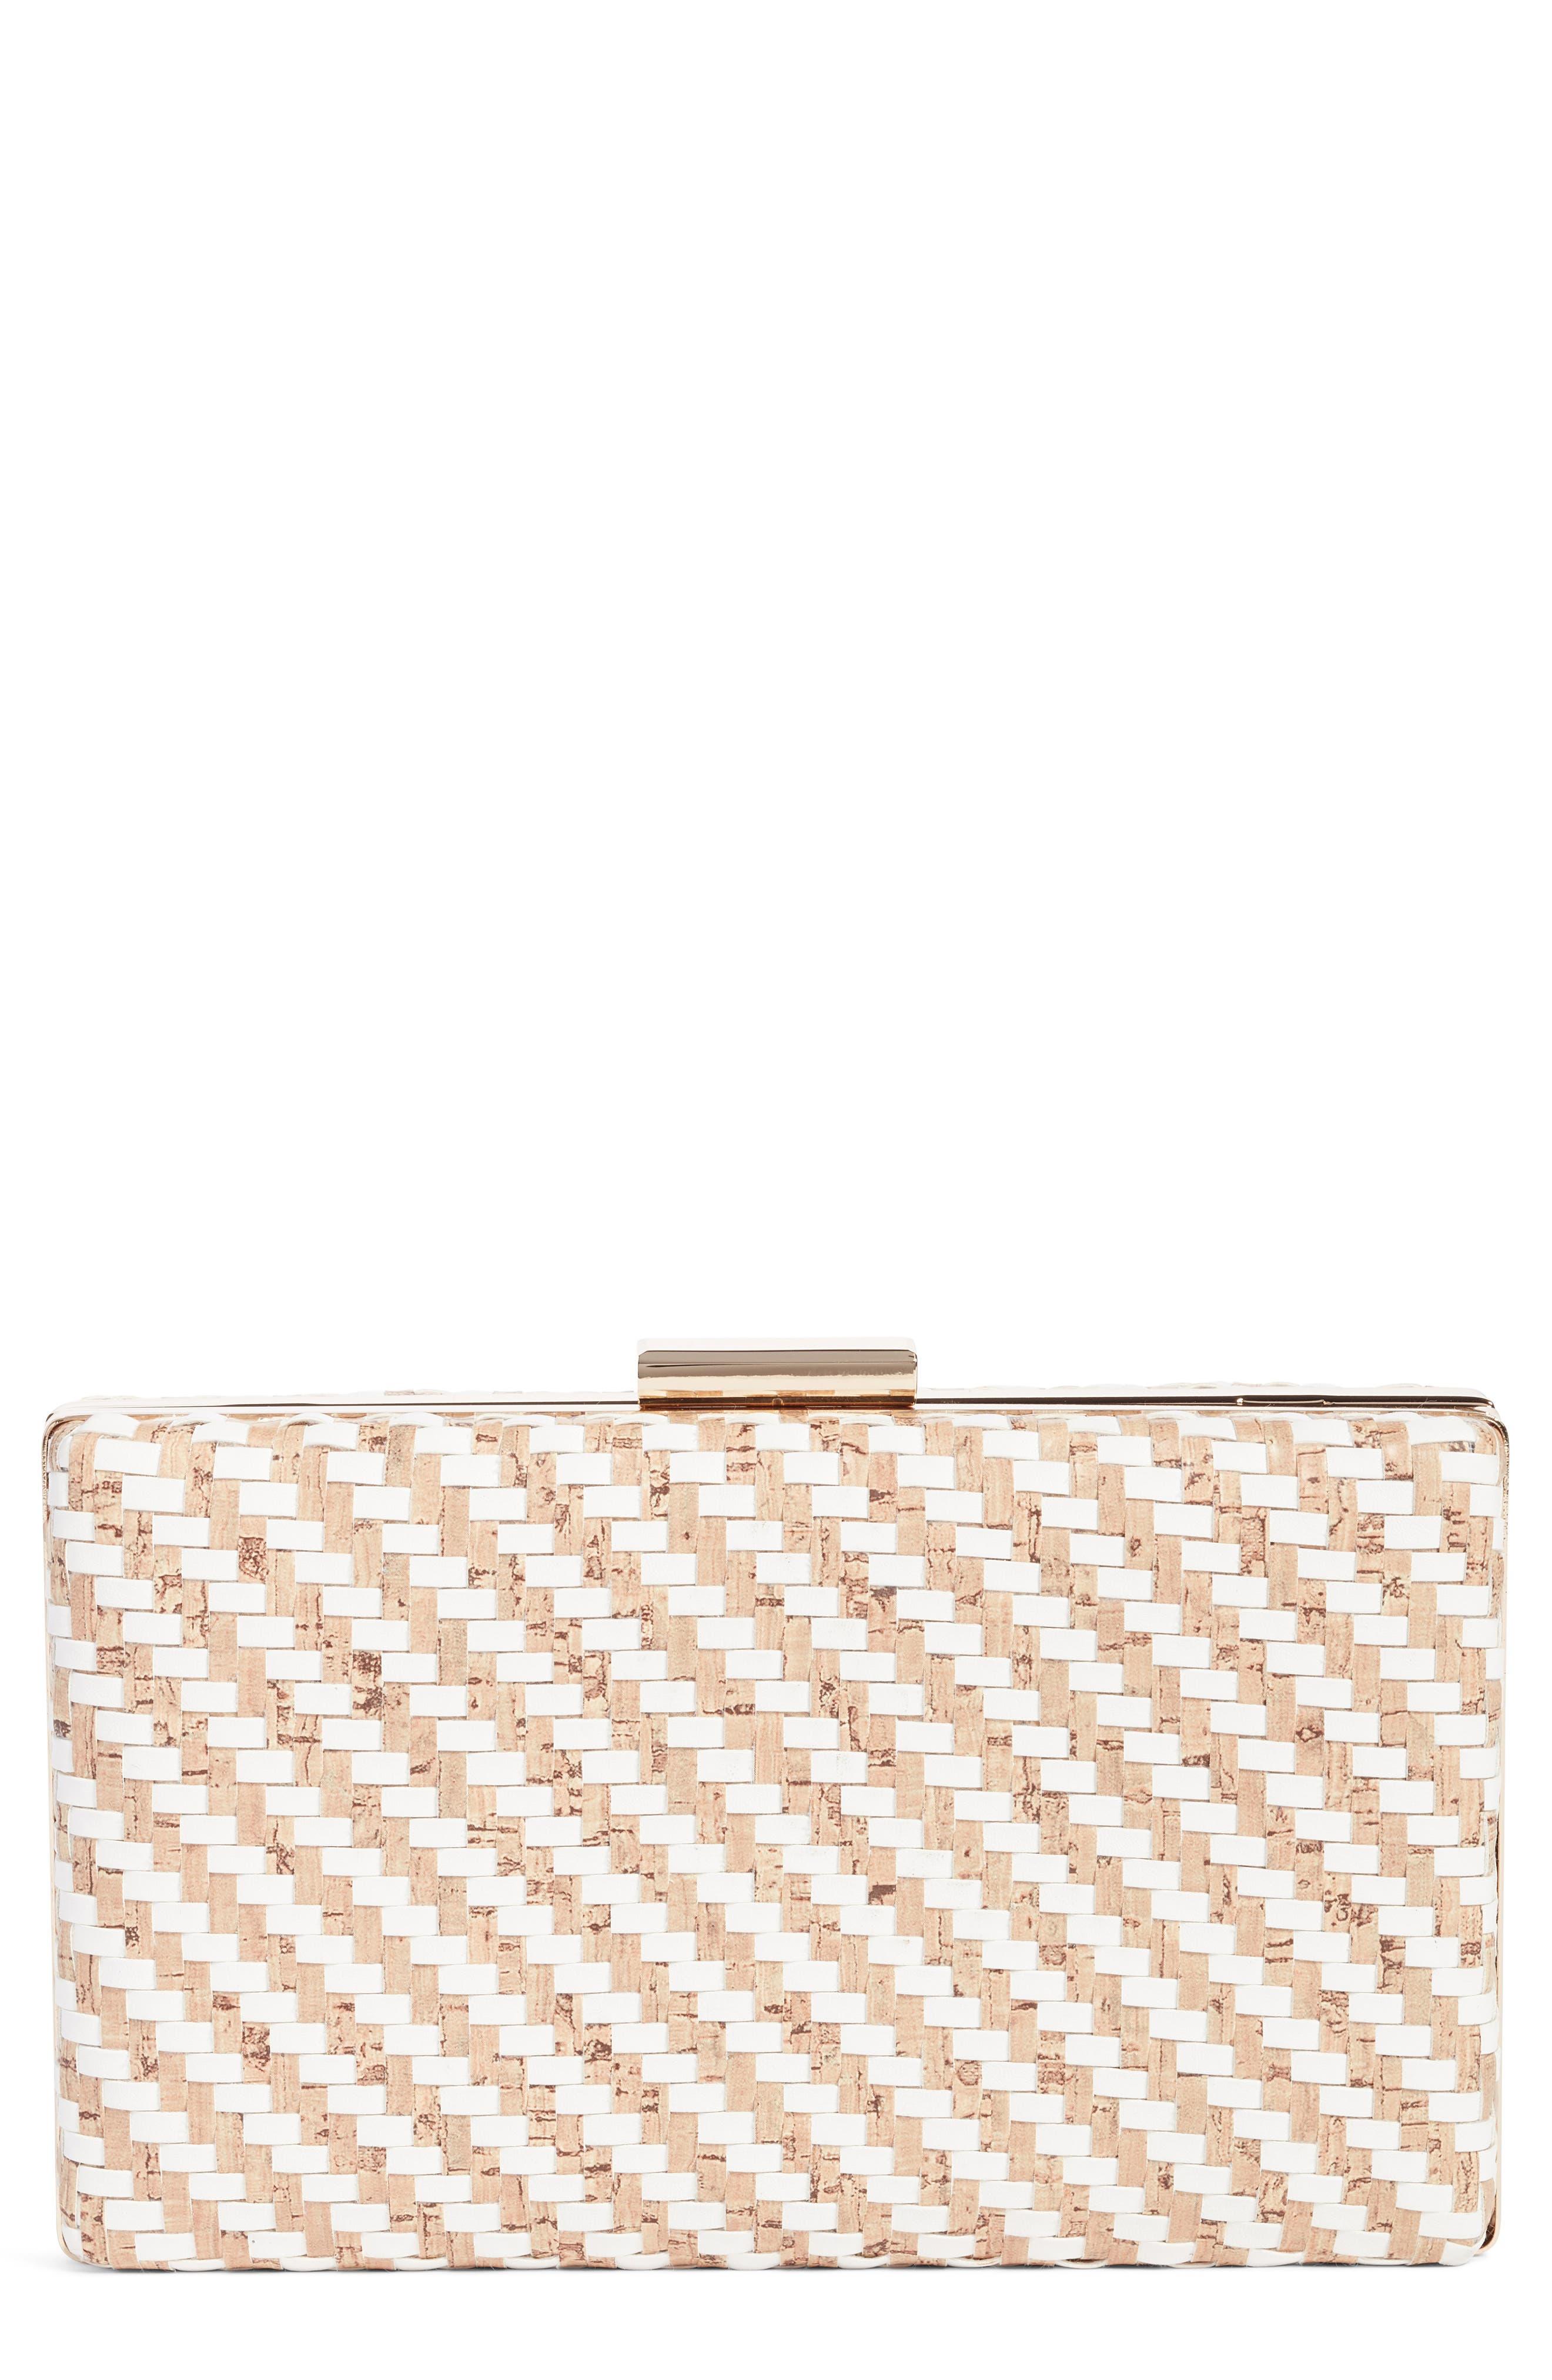 Woven Cork & Faux Leather Clutch,                             Main thumbnail 1, color,                             White